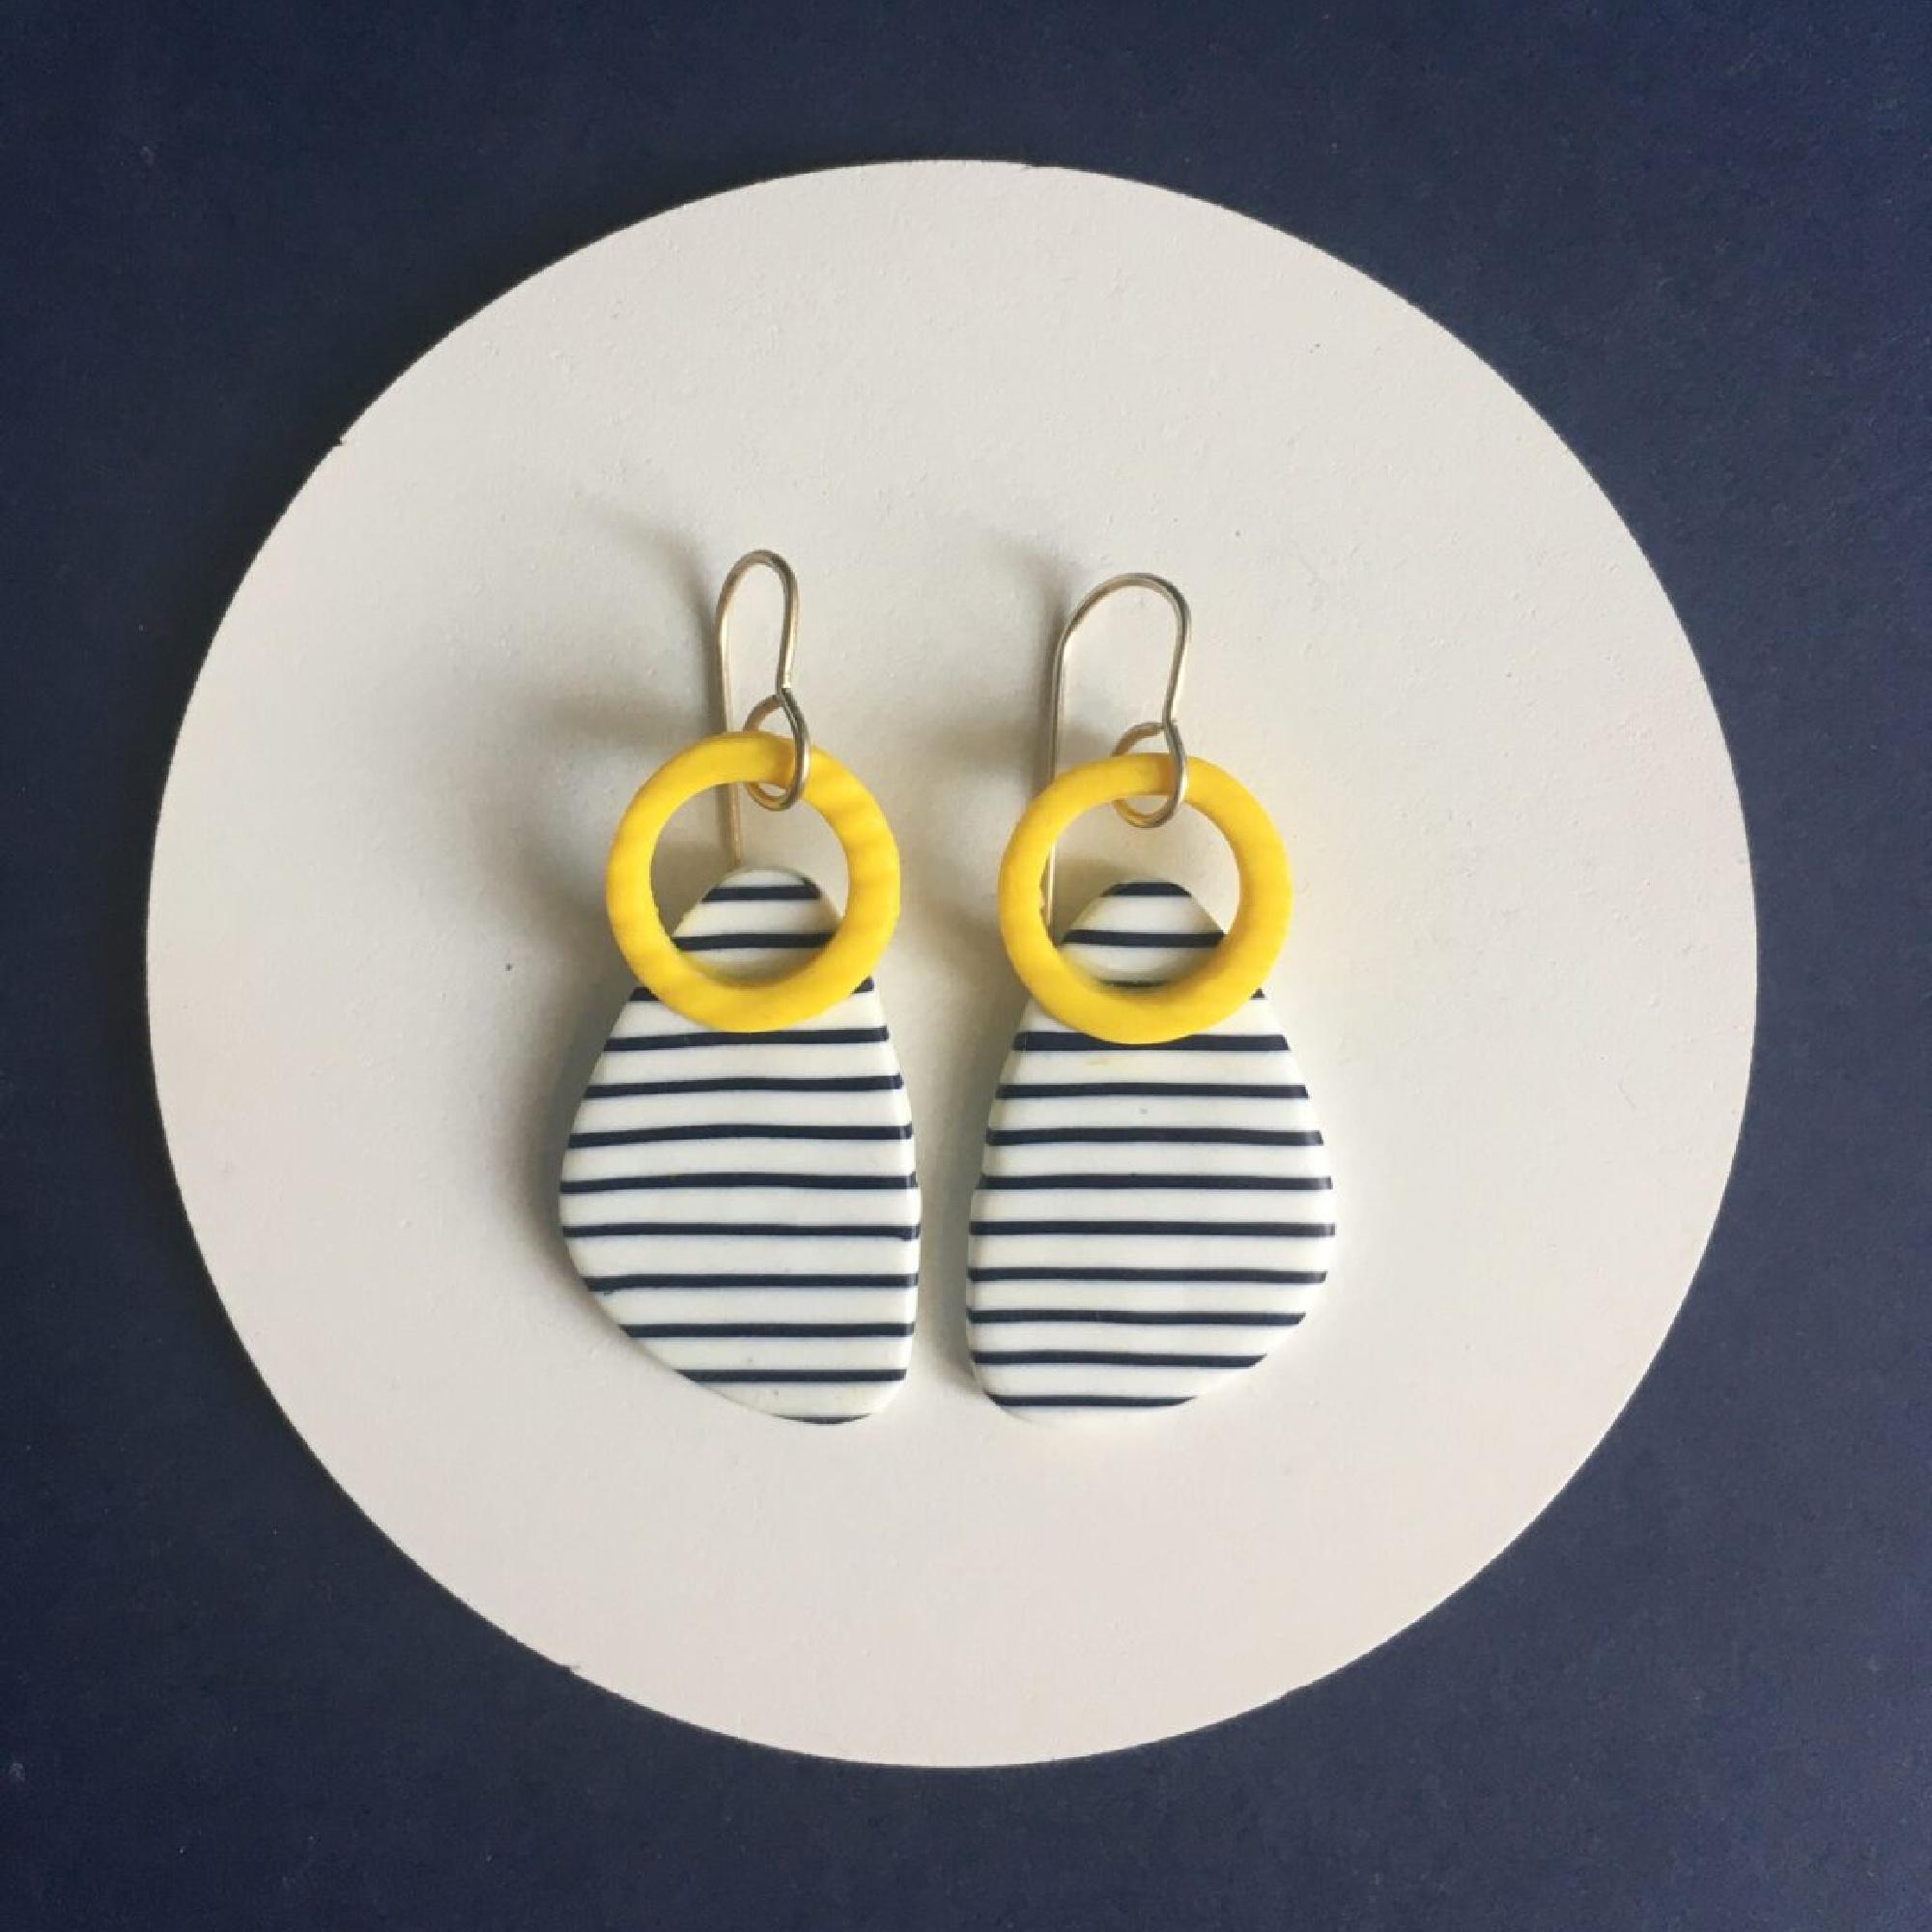 Quimper Breton Earrings by Nadege Honey